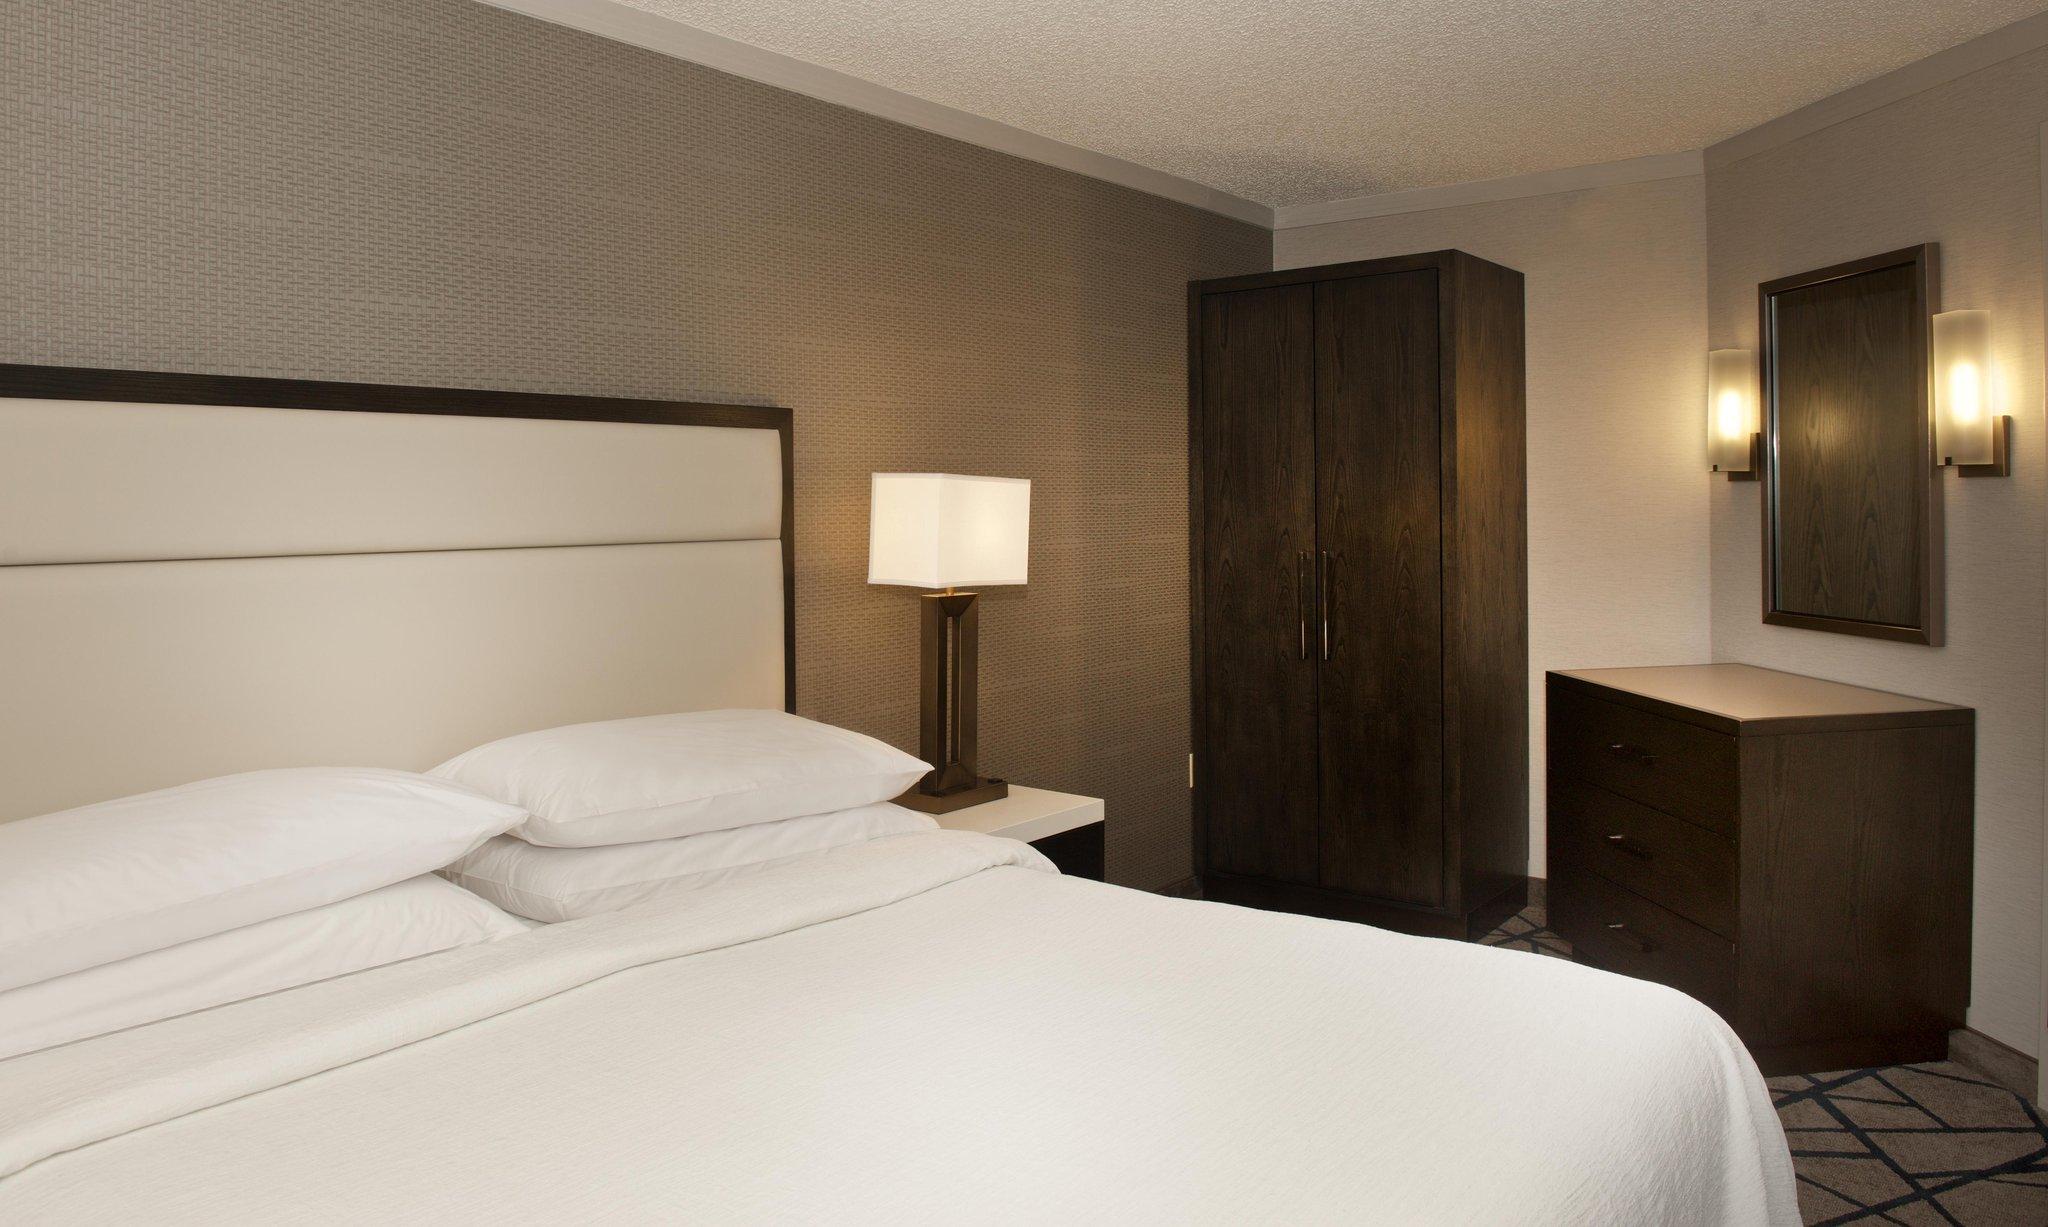 Embassy Suites by Hilton Portland Washington Square